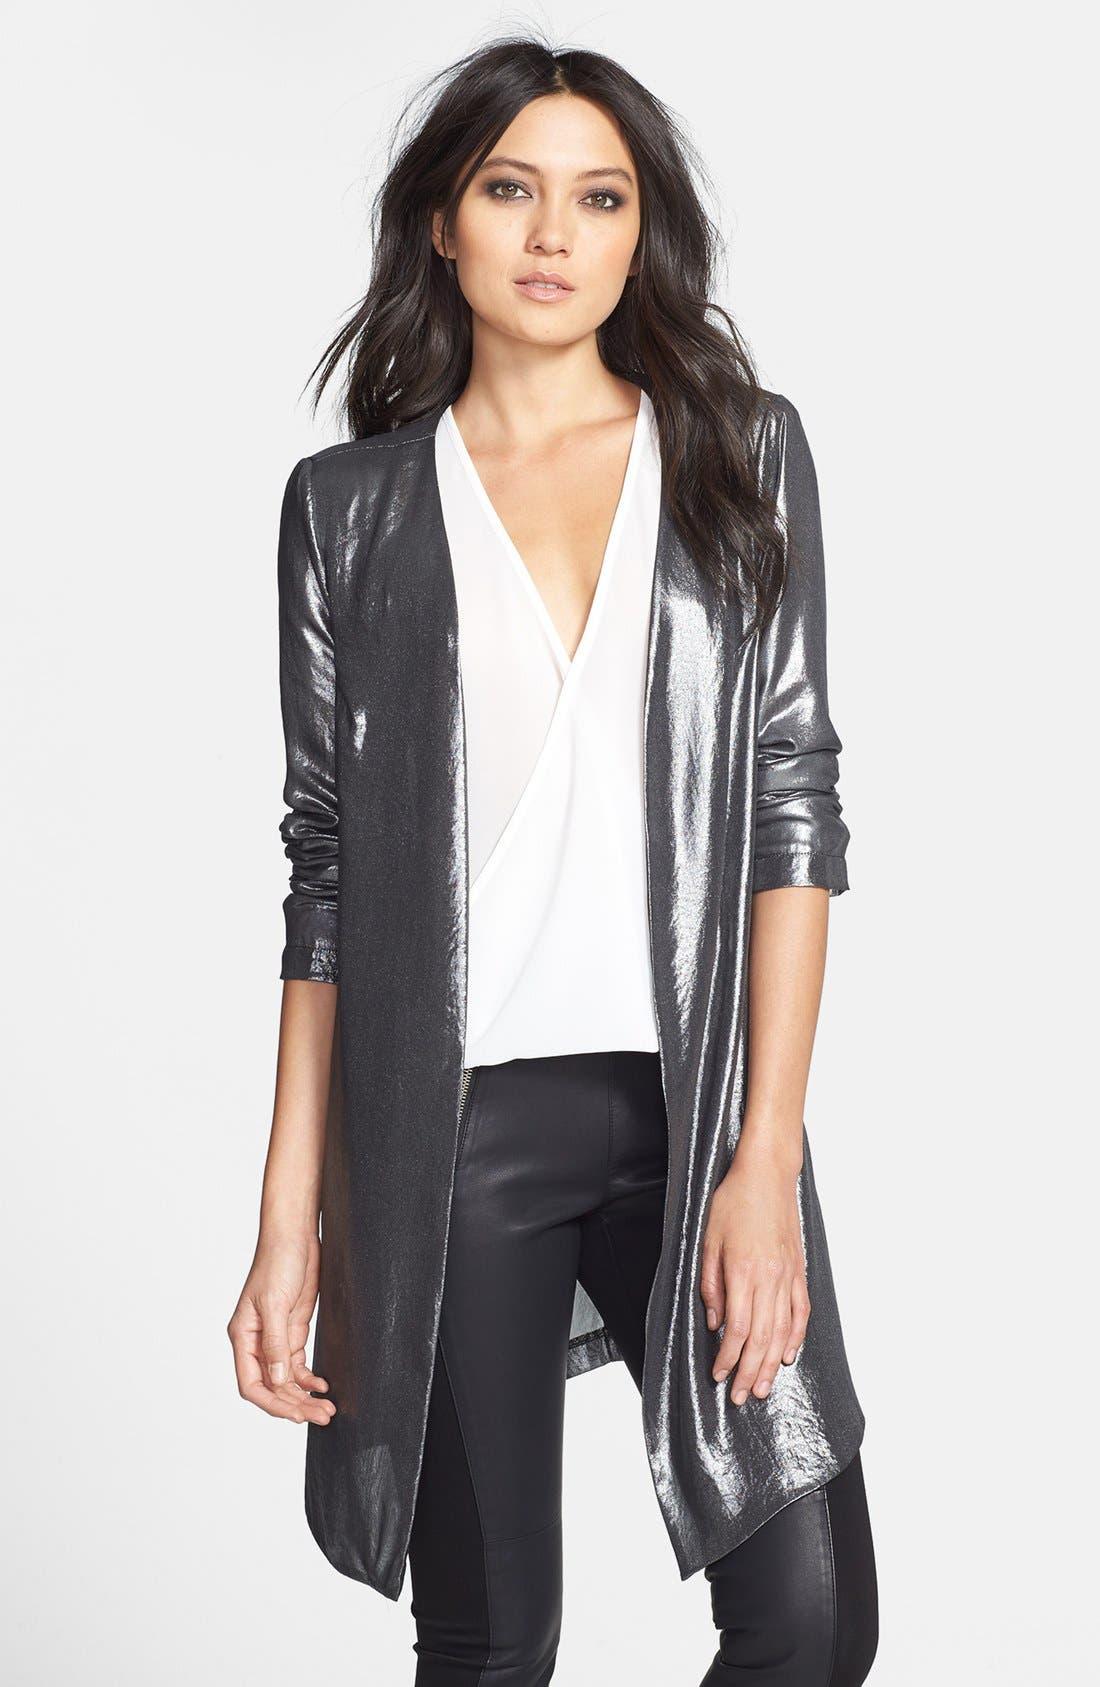 Alternate Image 1 Selected - ASTR Open Front Metallic Jacket